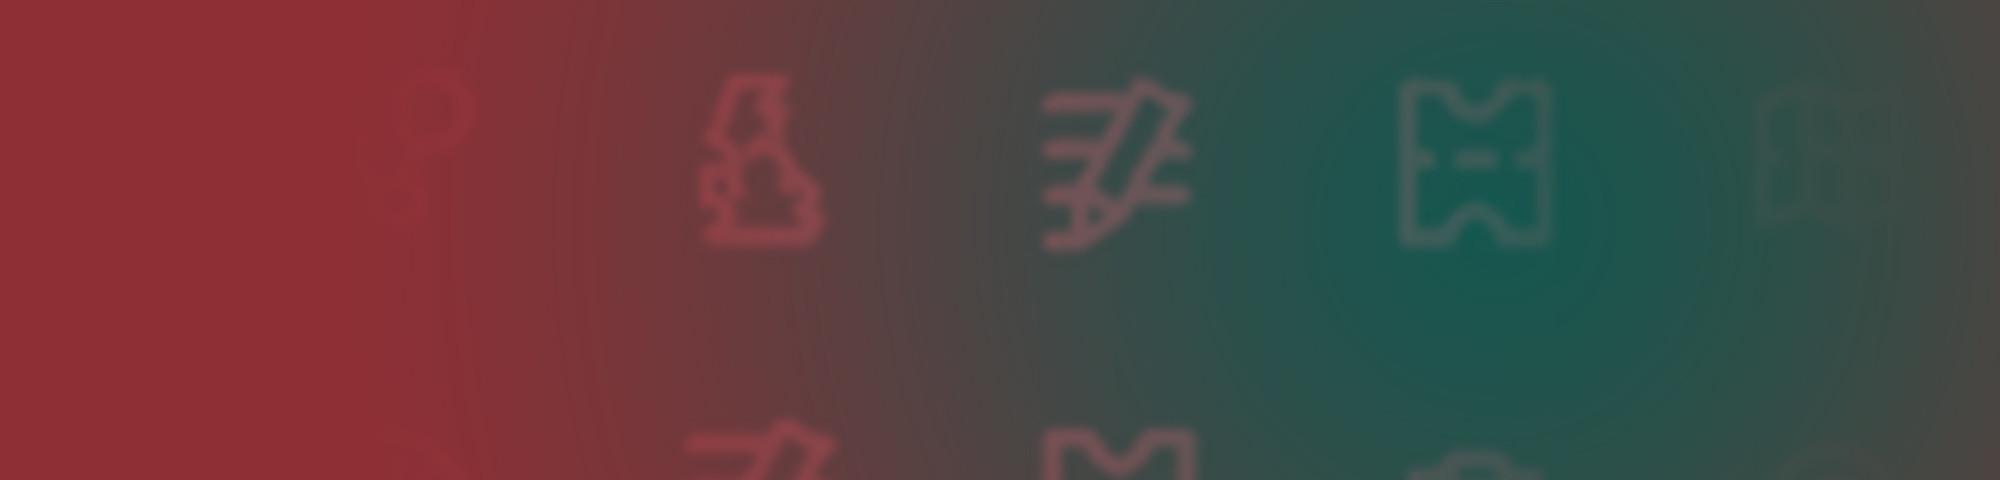 Image of Artform Coding.jpg